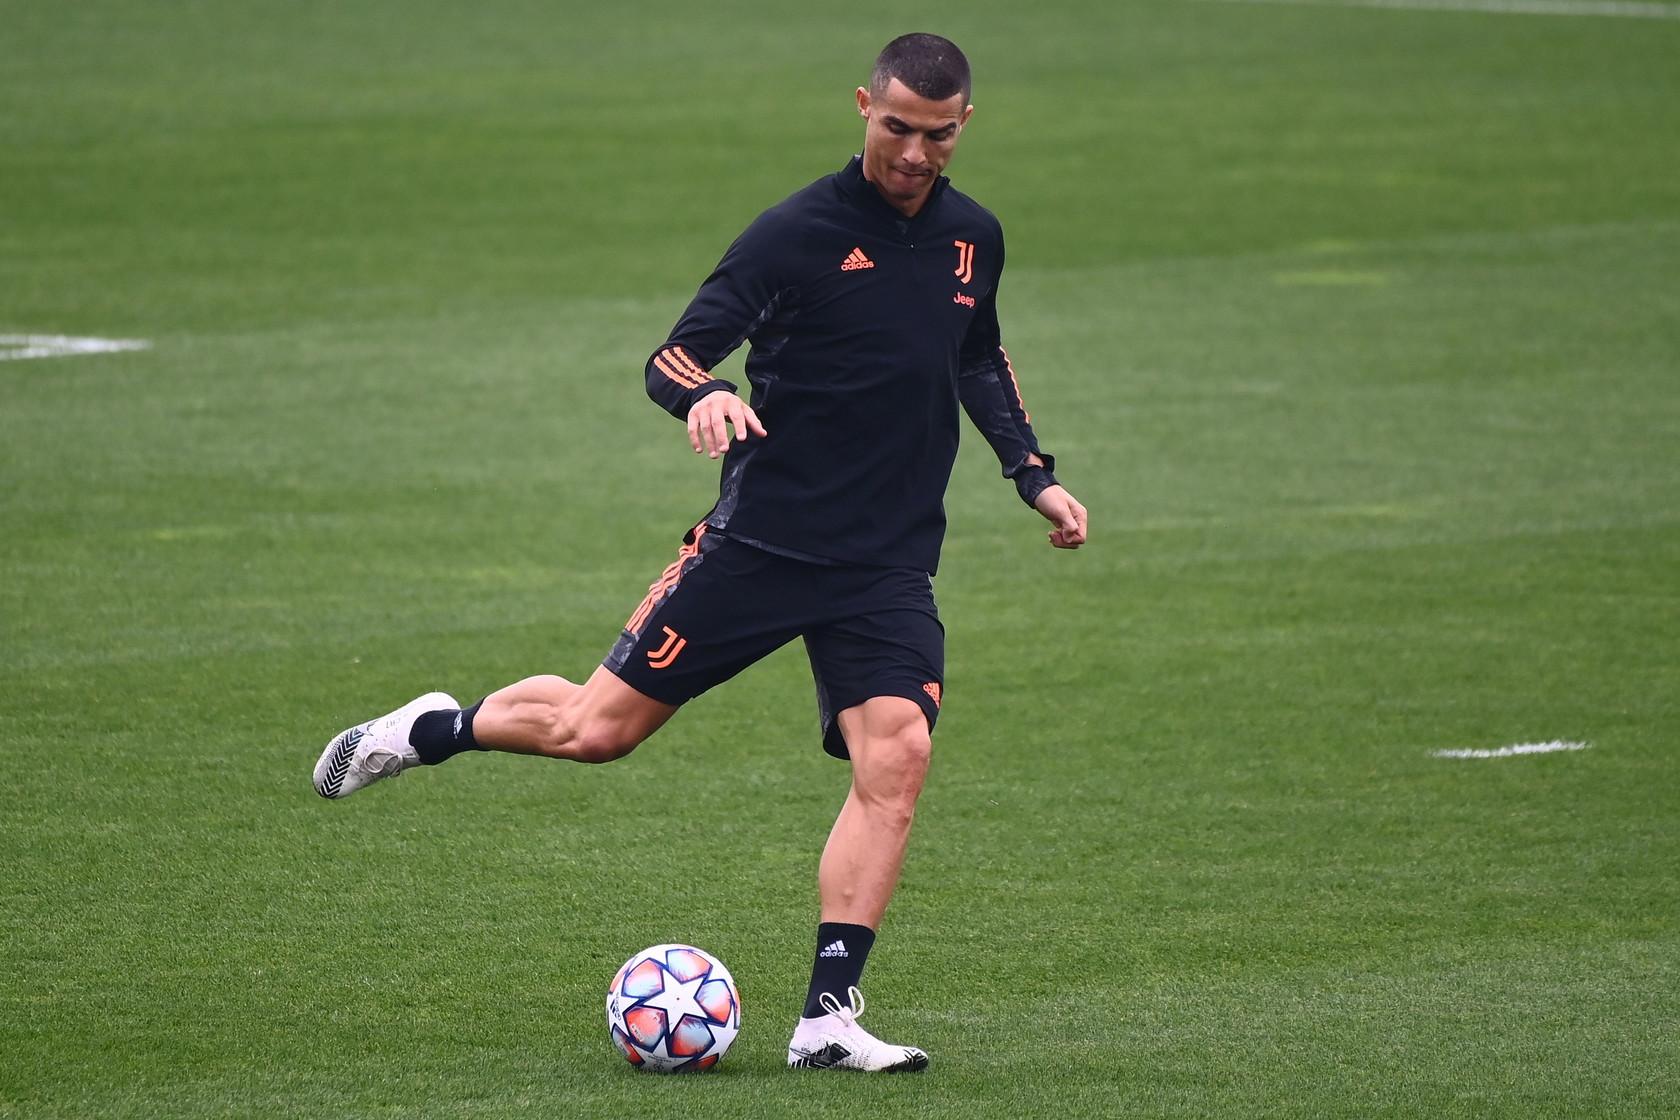 Juventus, rifinitura in vista del Ferencvaros: Pirlo ritrova Chiellini - Sportmediaset